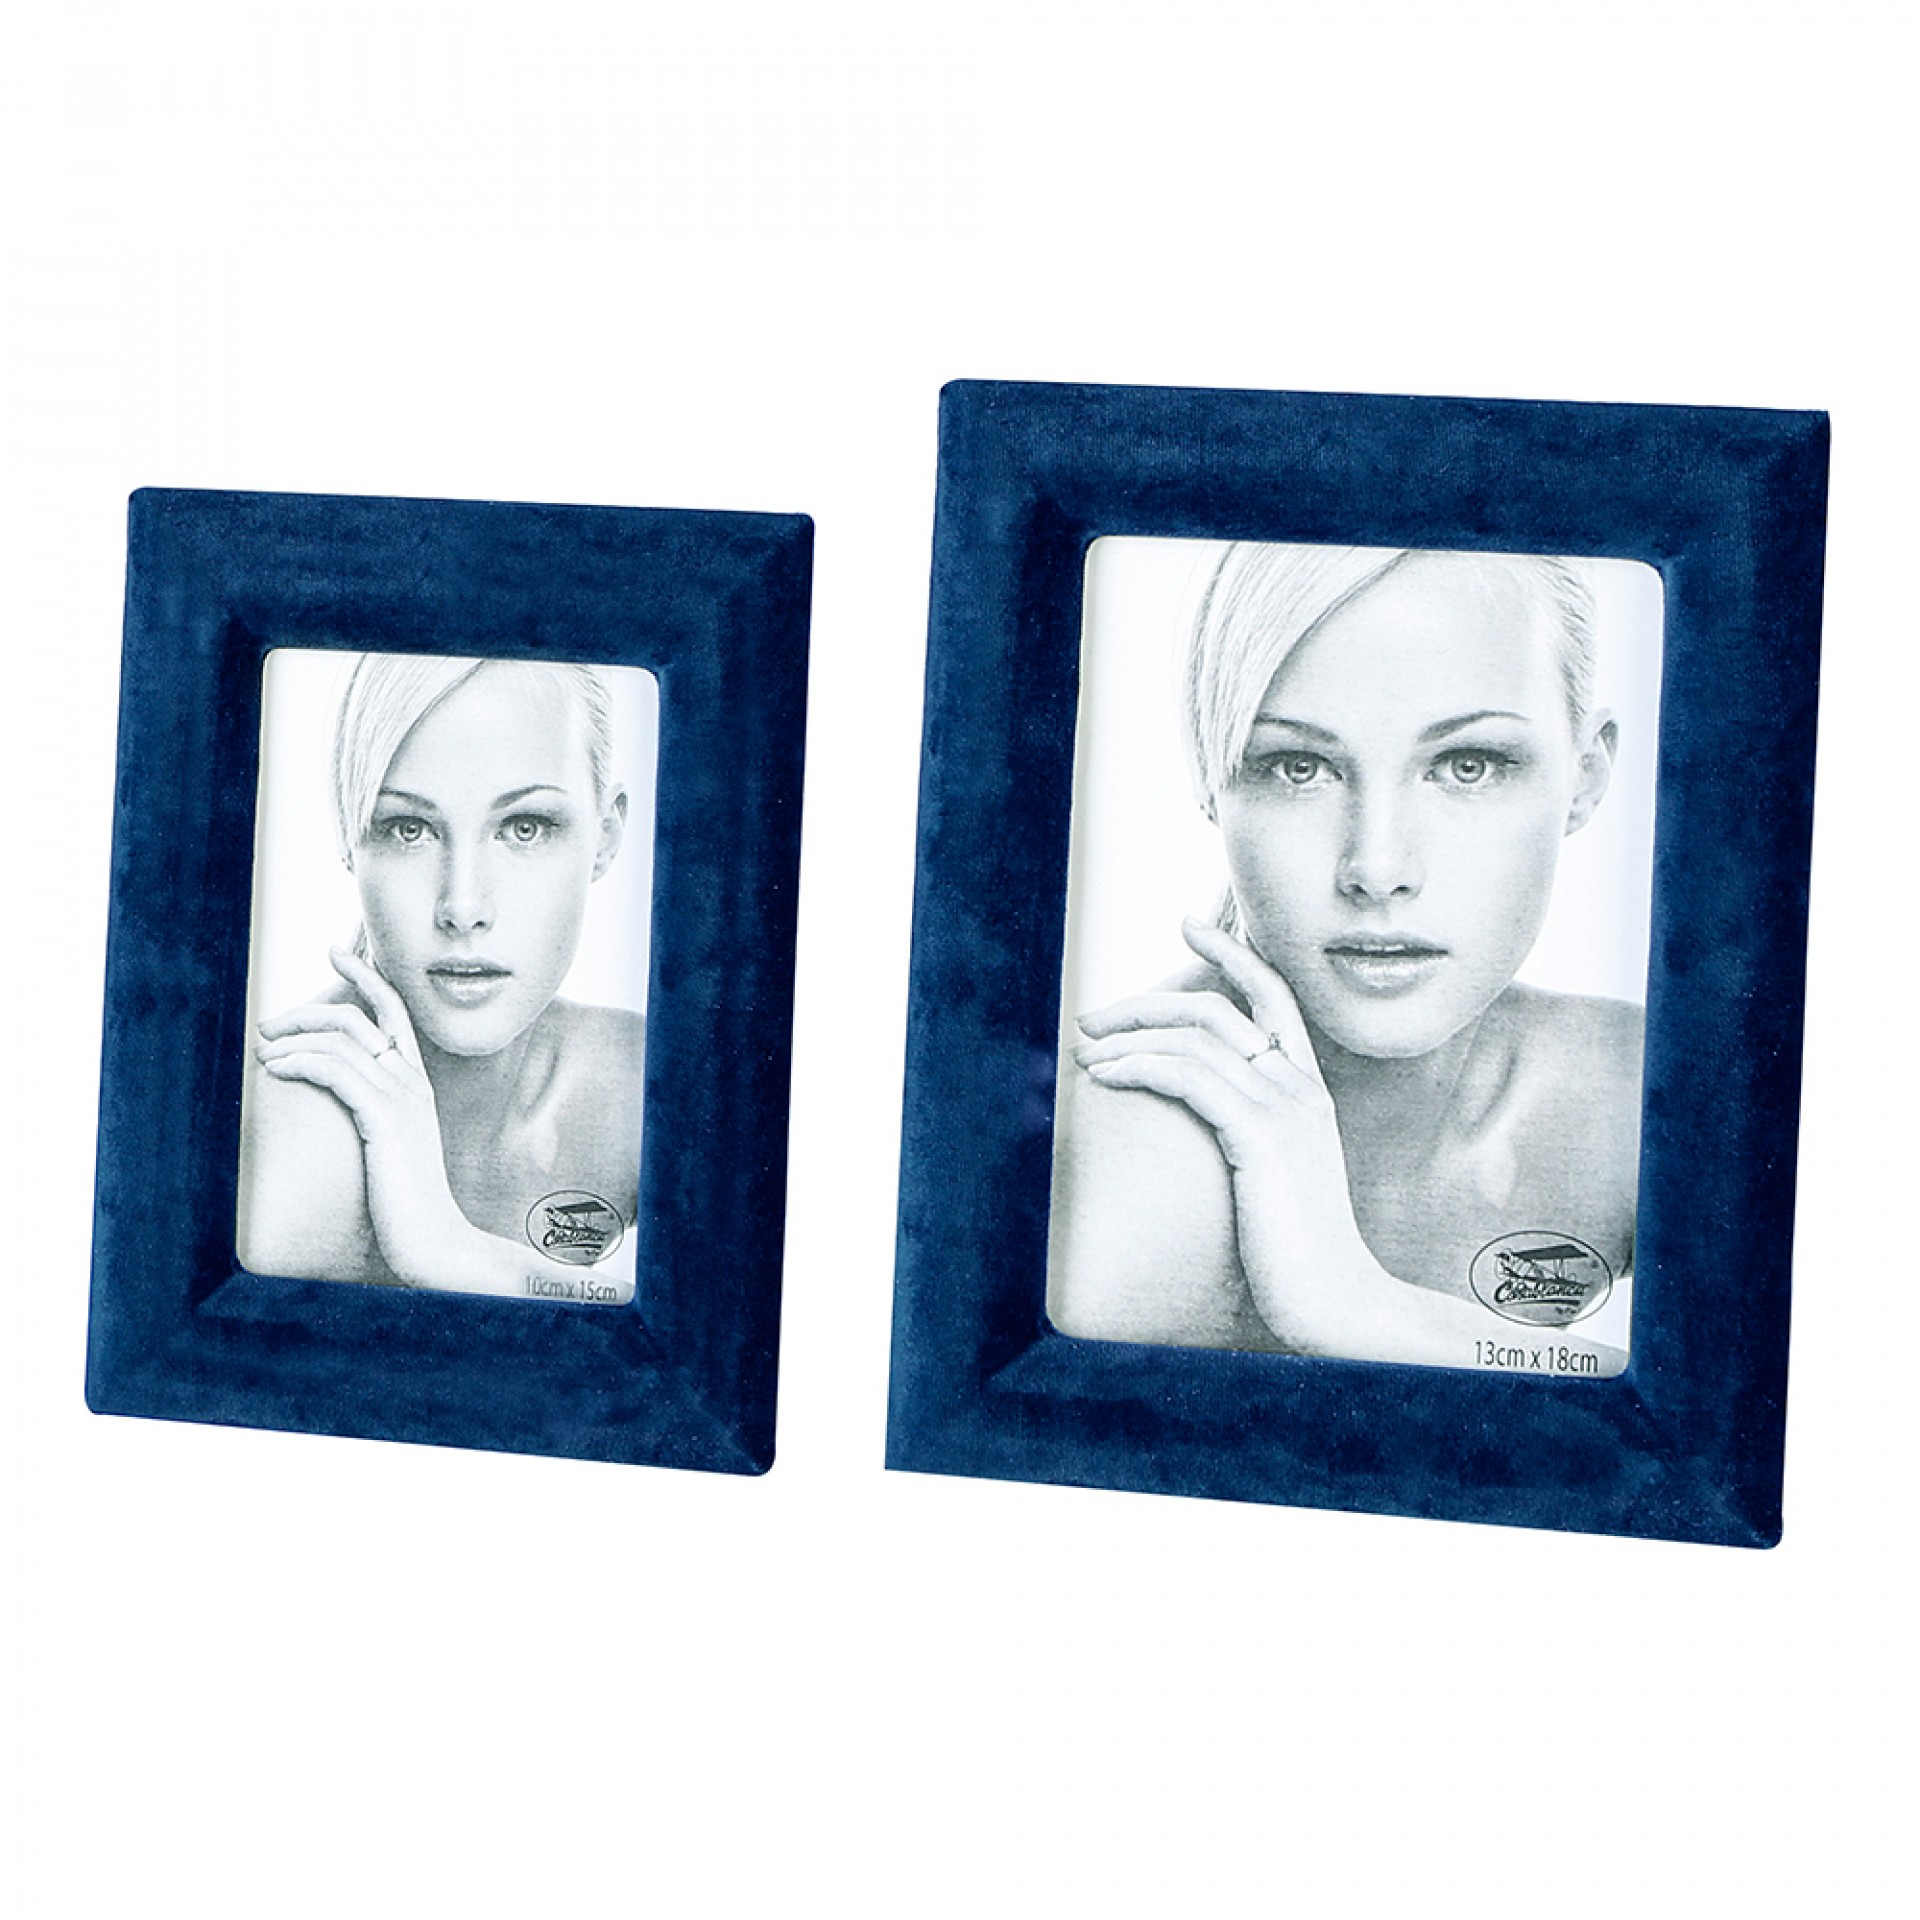 Rámeček na fotky Royal, 23x18 cm, modrý samet